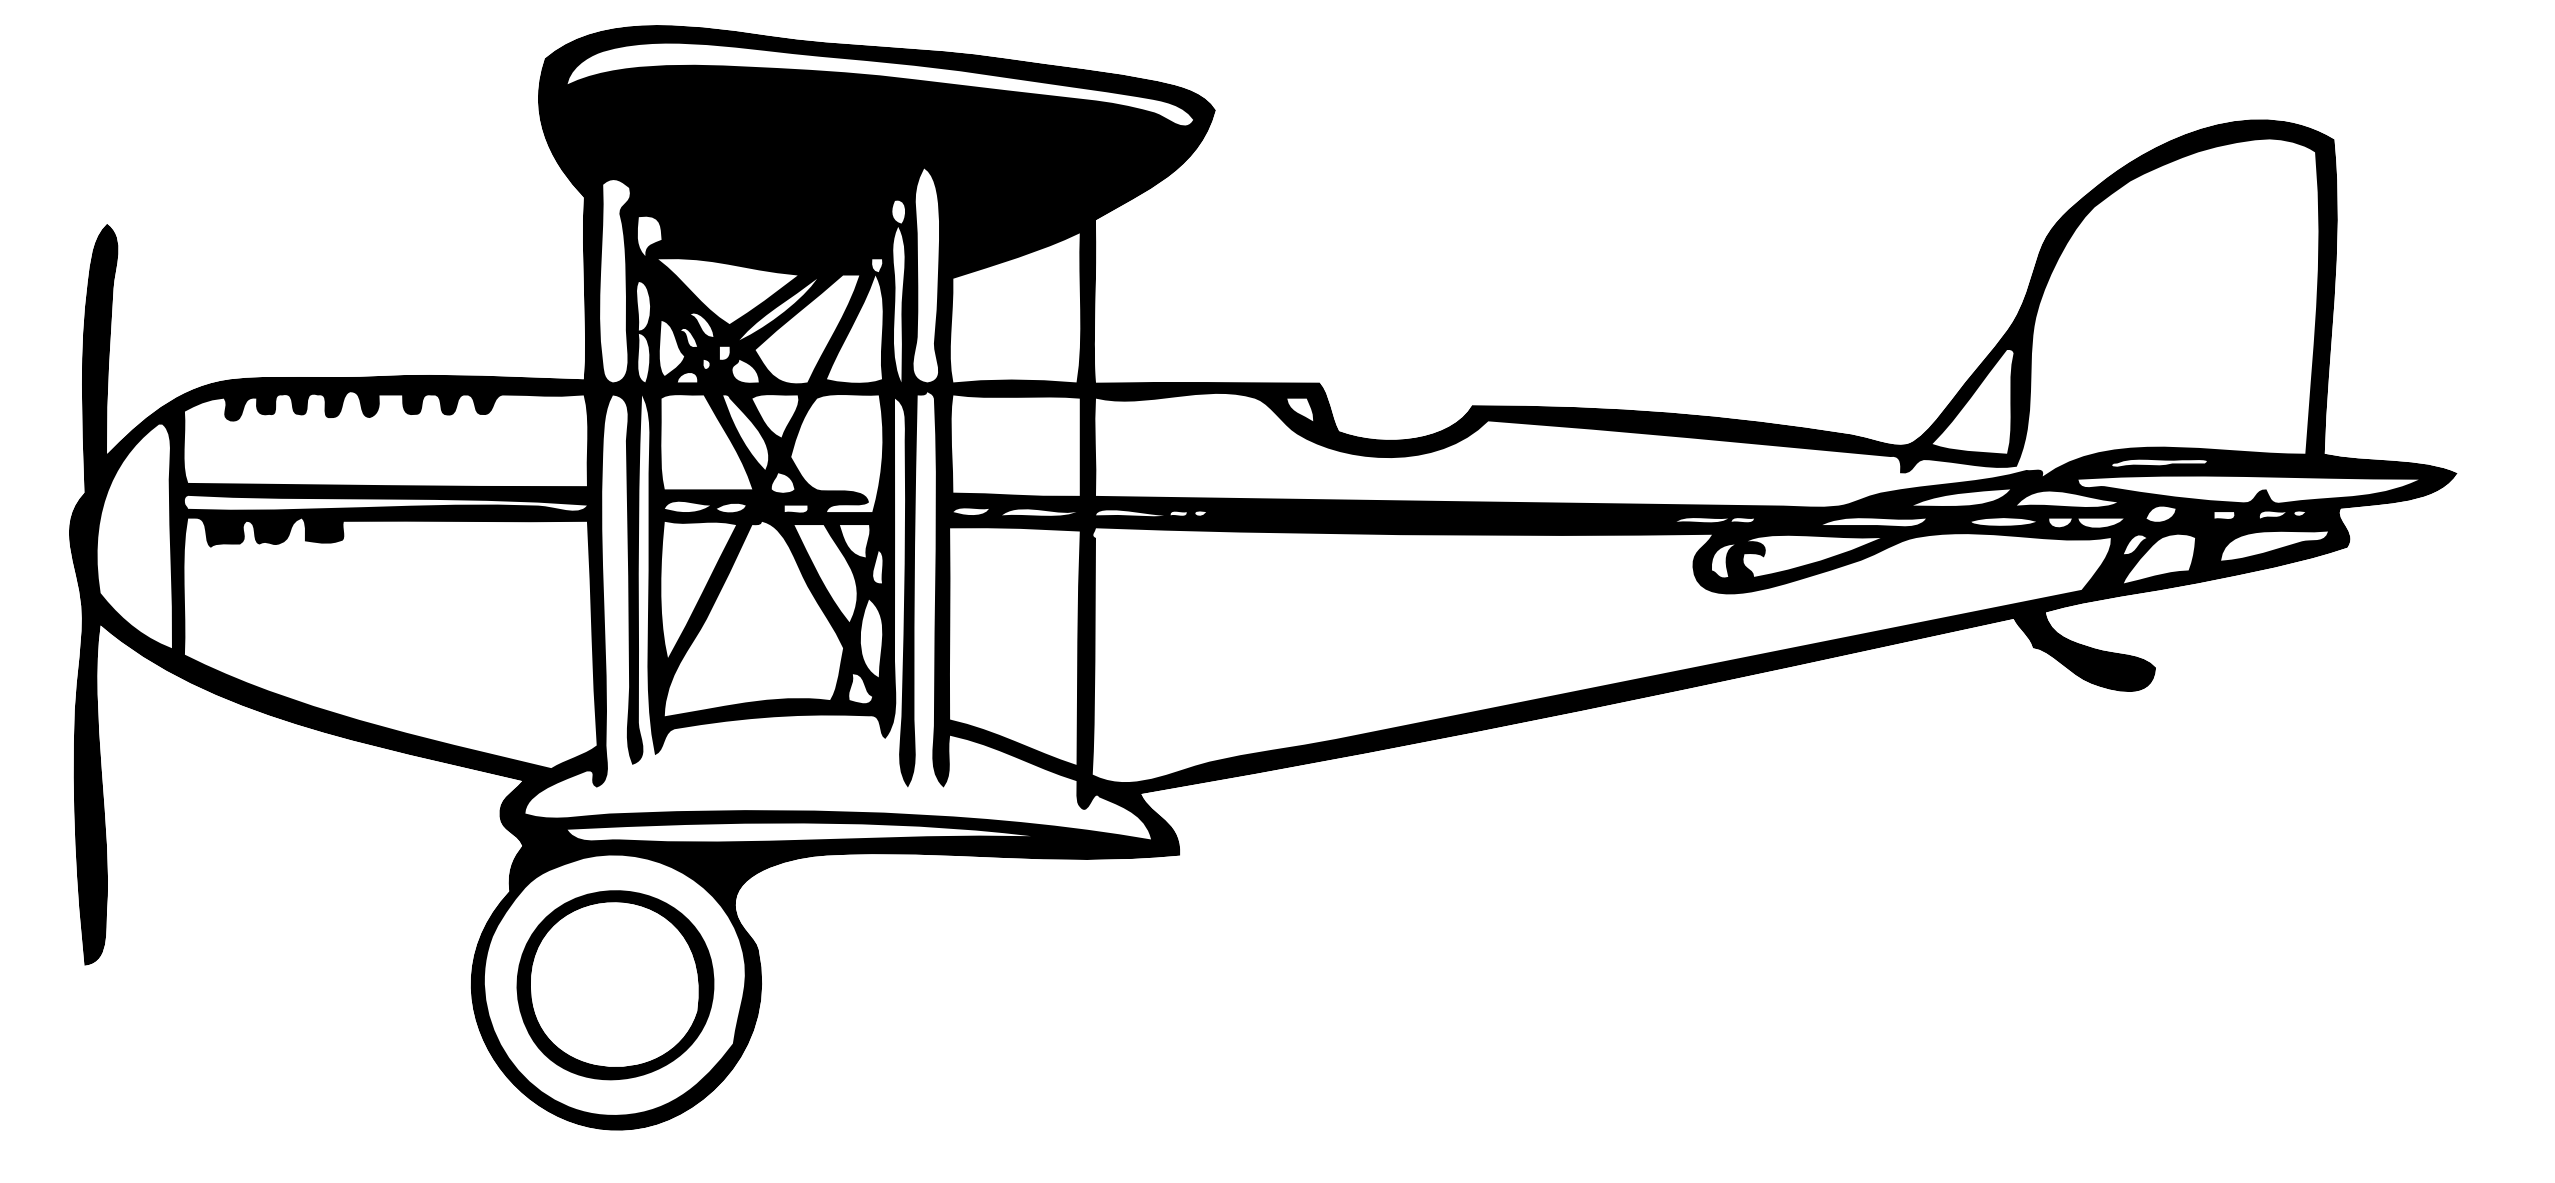 Biplane clipart illustration. Free cliparts download clip